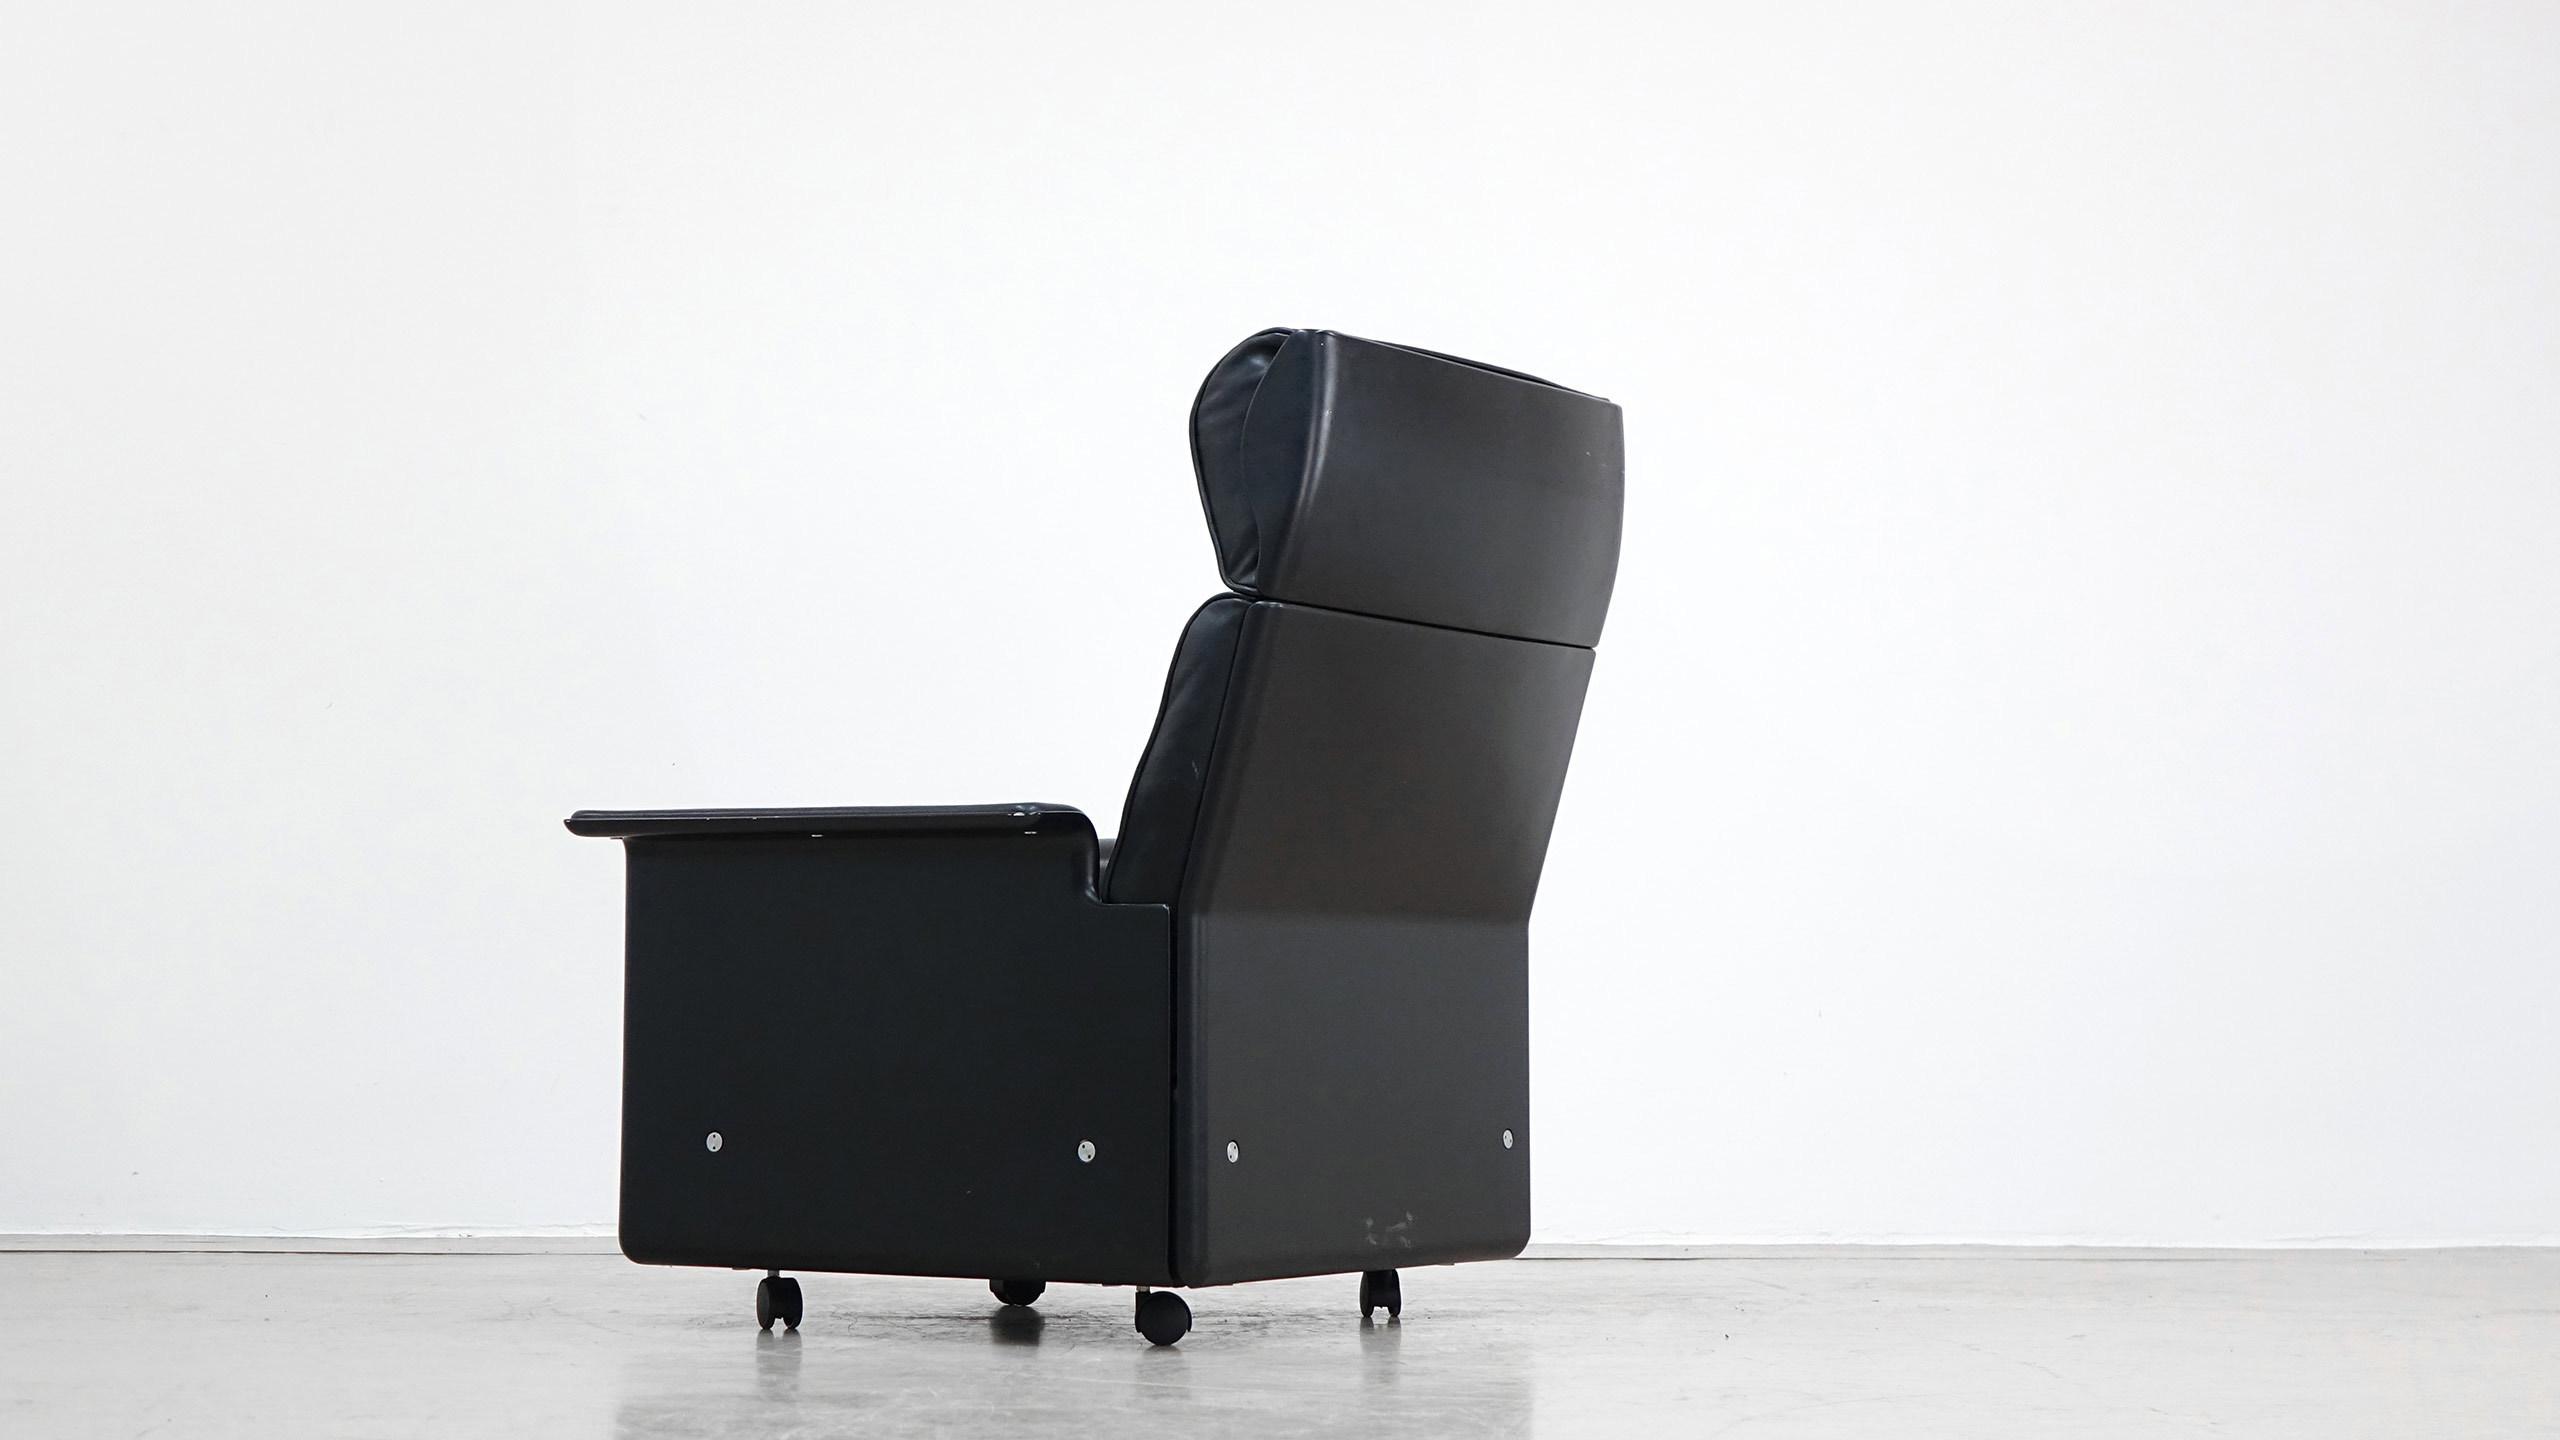 dieter rams sessel rz 620 by vitsoe. Black Bedroom Furniture Sets. Home Design Ideas